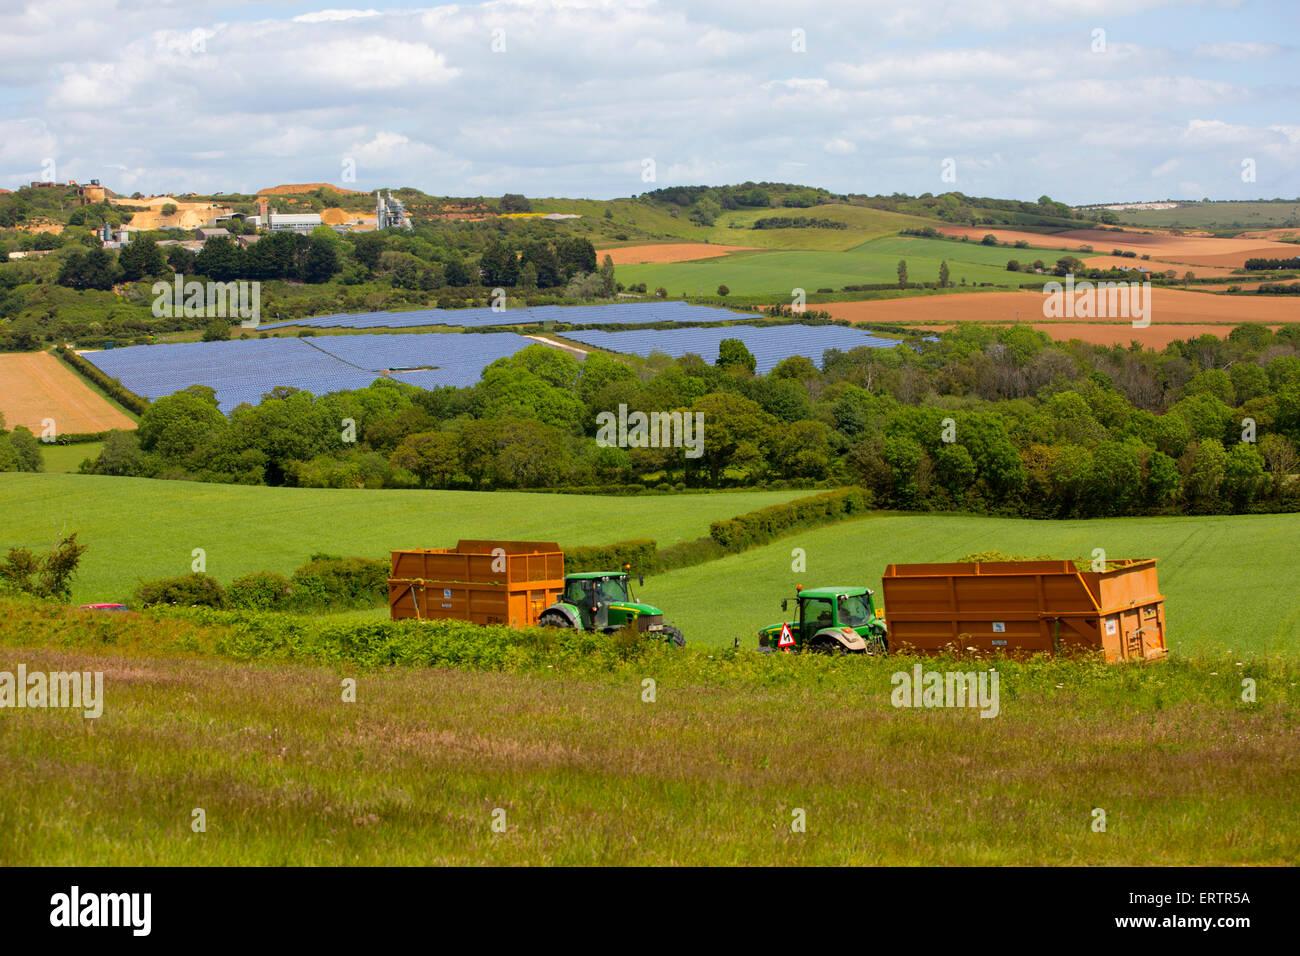 Solar Farm, panels, quarry, fields, farm, tractors, trailers, silage, biofuel Blackwater, Isle of Wight, England, - Stock Image